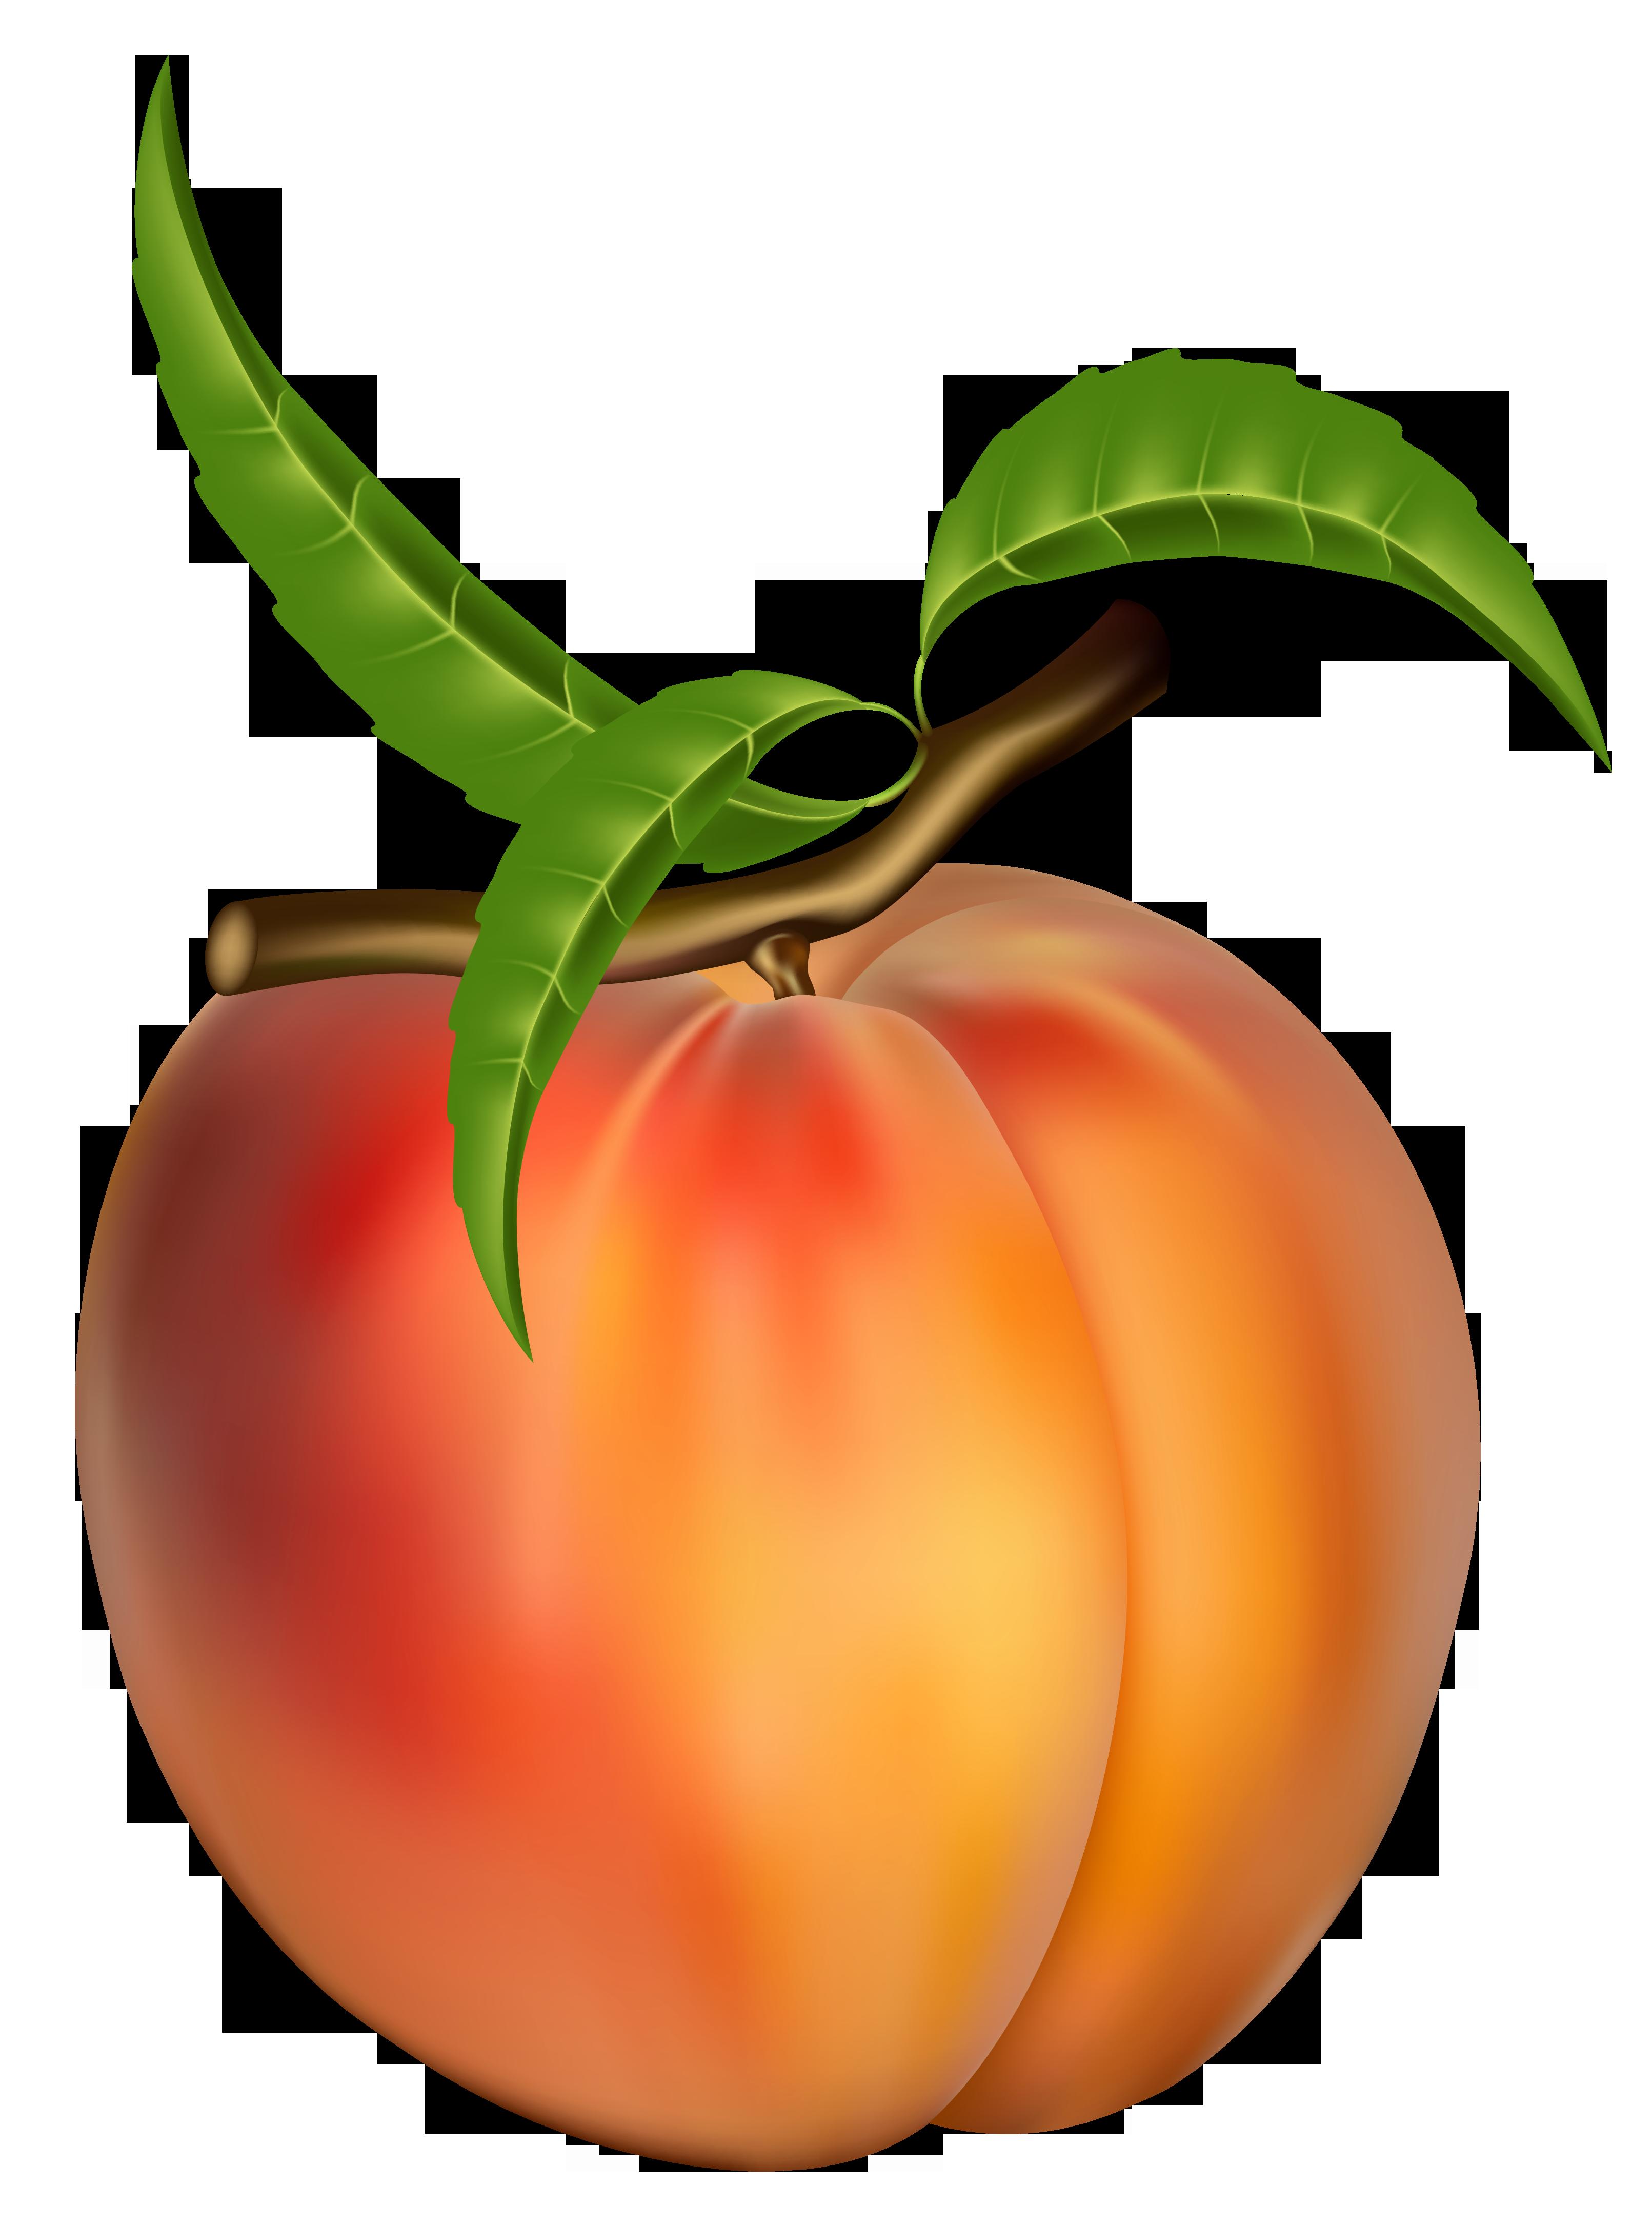 Orange (Fruit) clipart epal Clip Peach Free Clipartix art